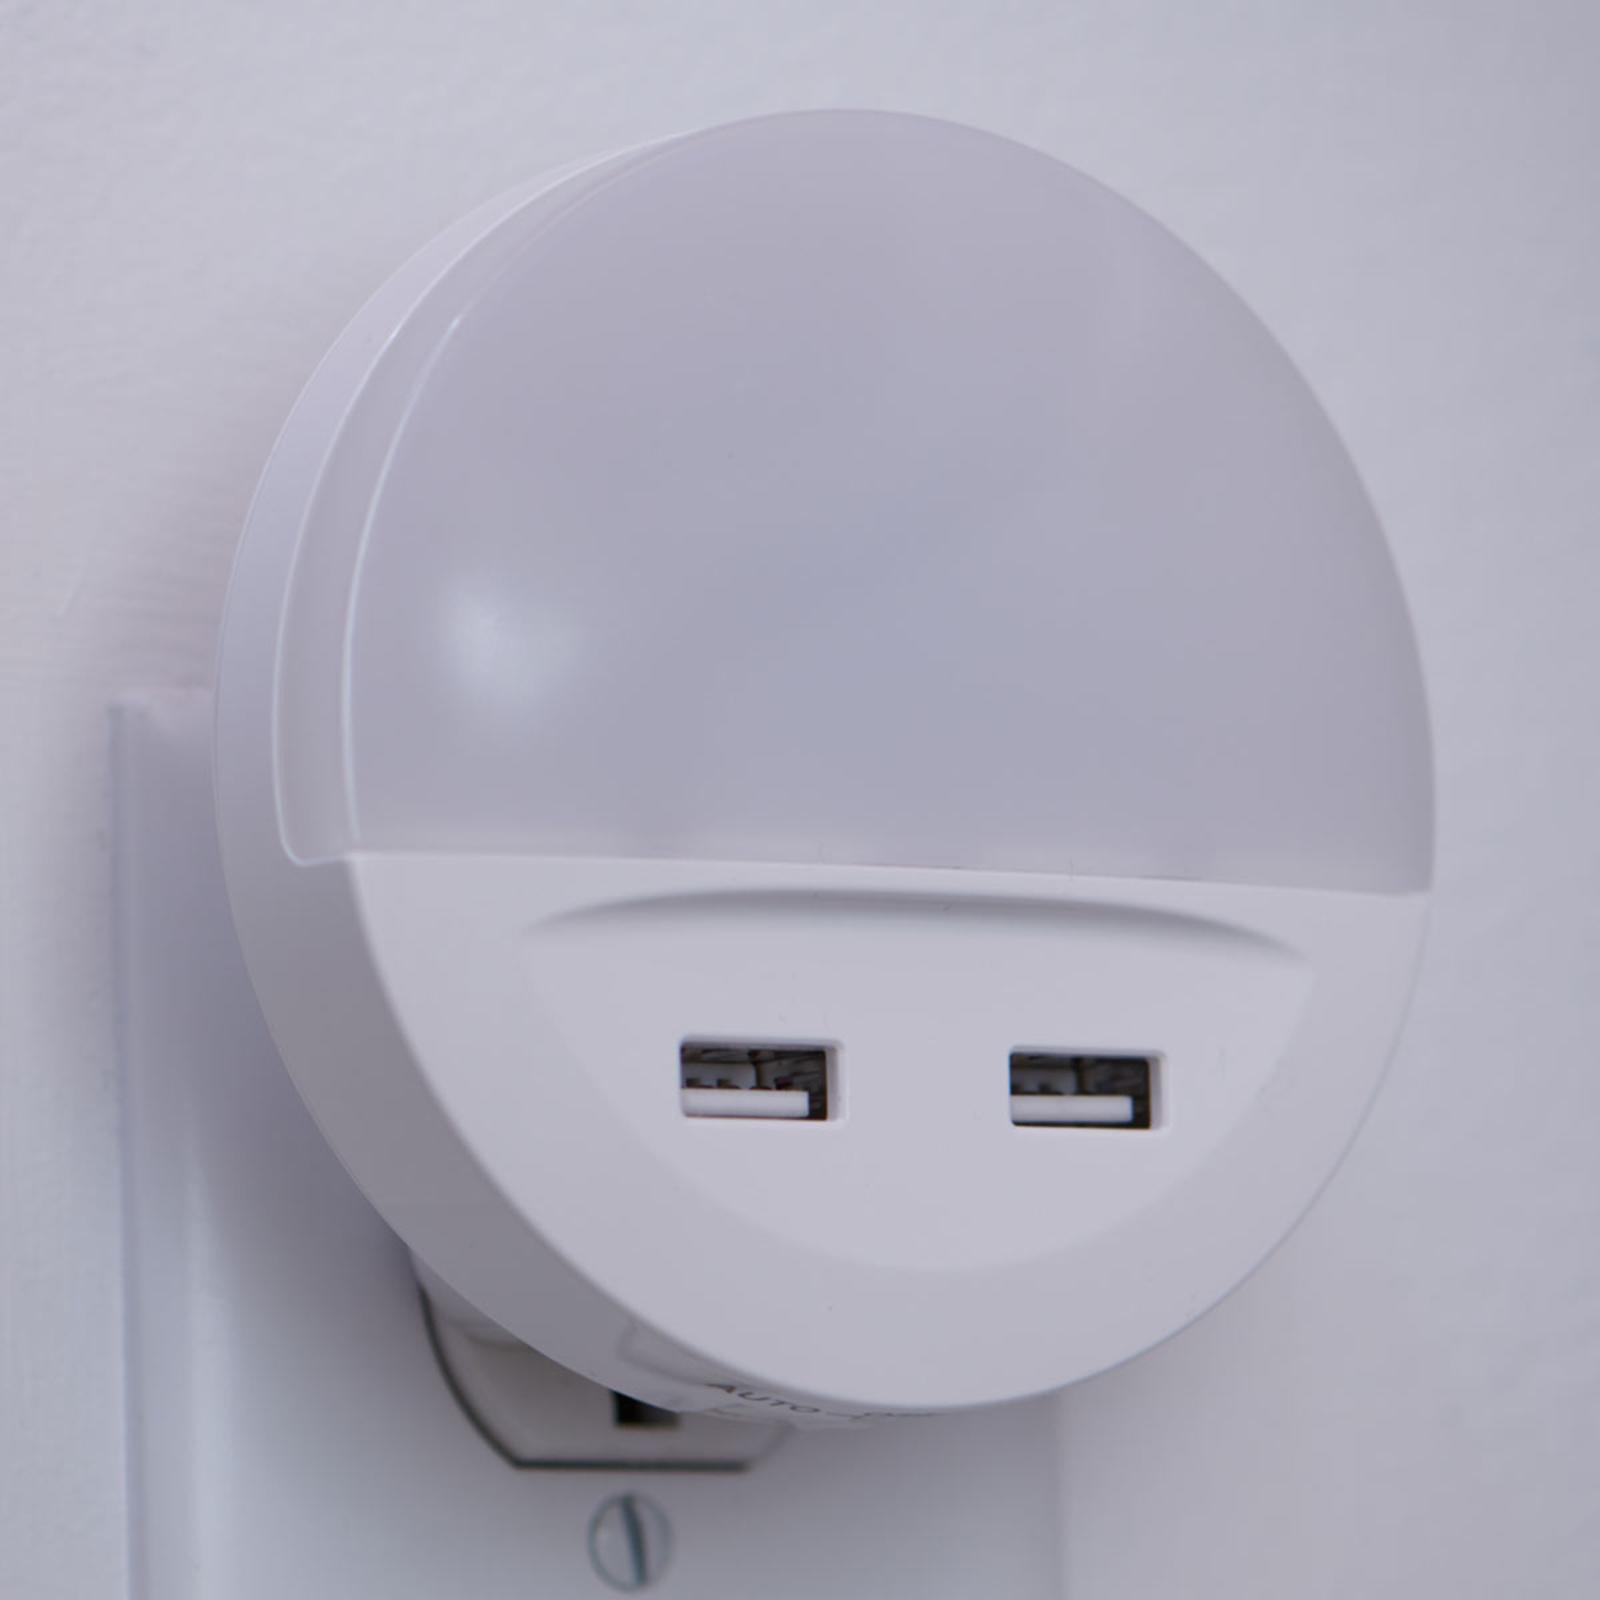 LEDVANCE Lunetta USB LED night light with USB port_6106168_1